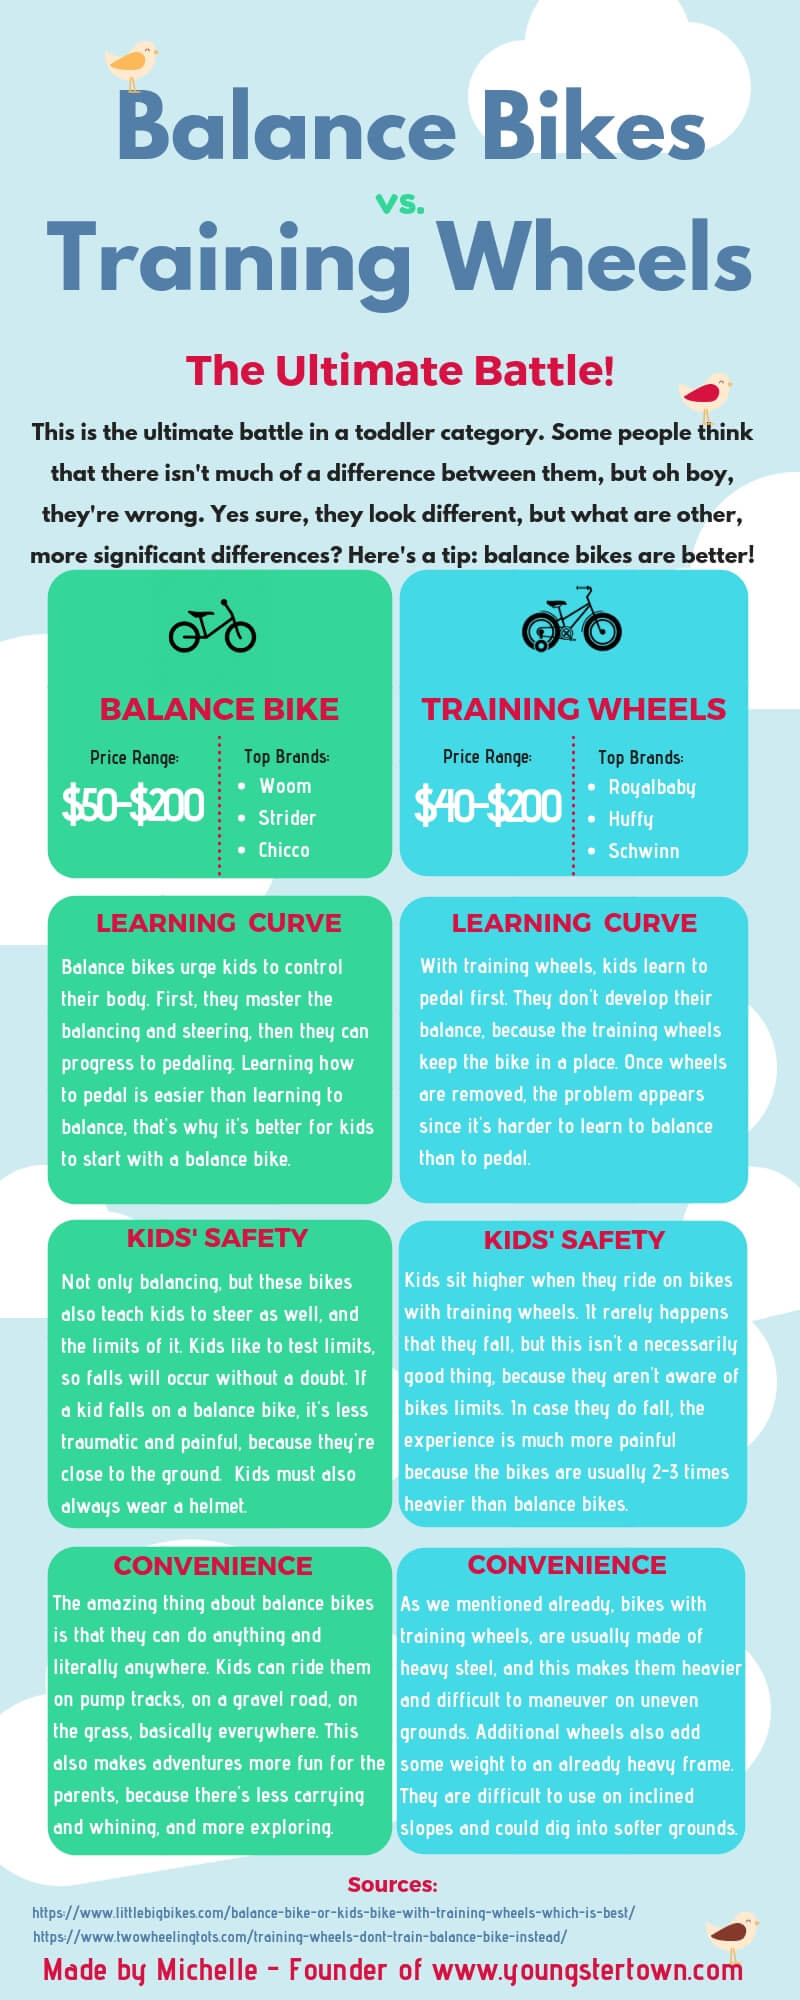 balance-bikes-training-wheels-infographic-plaza